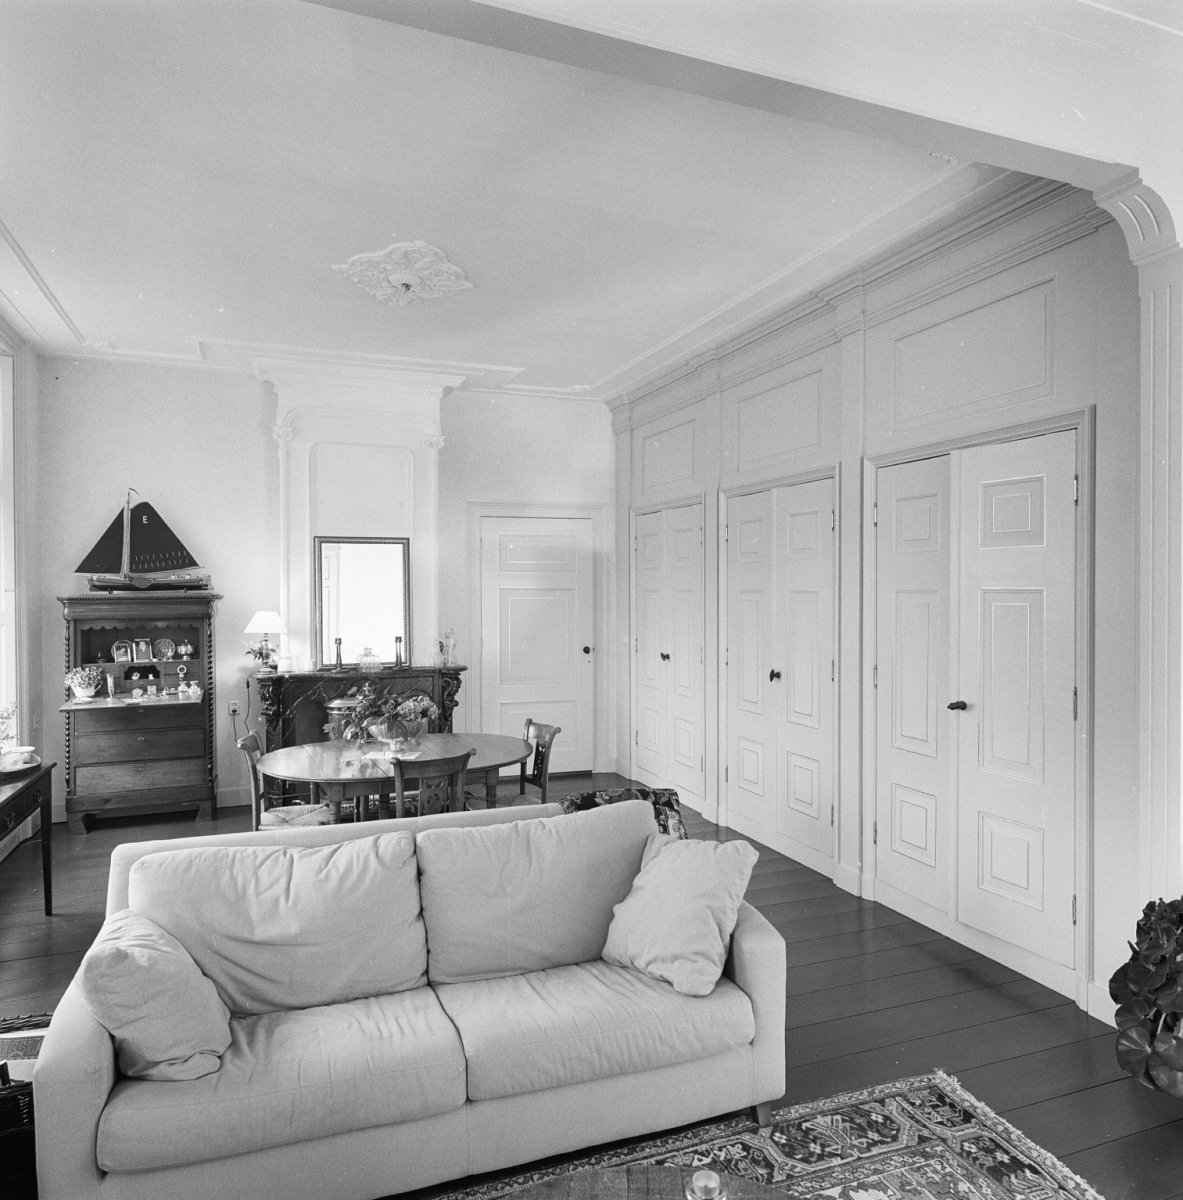 File interieur overzicht woonkamer met kastenwand for Interieur woonkamer